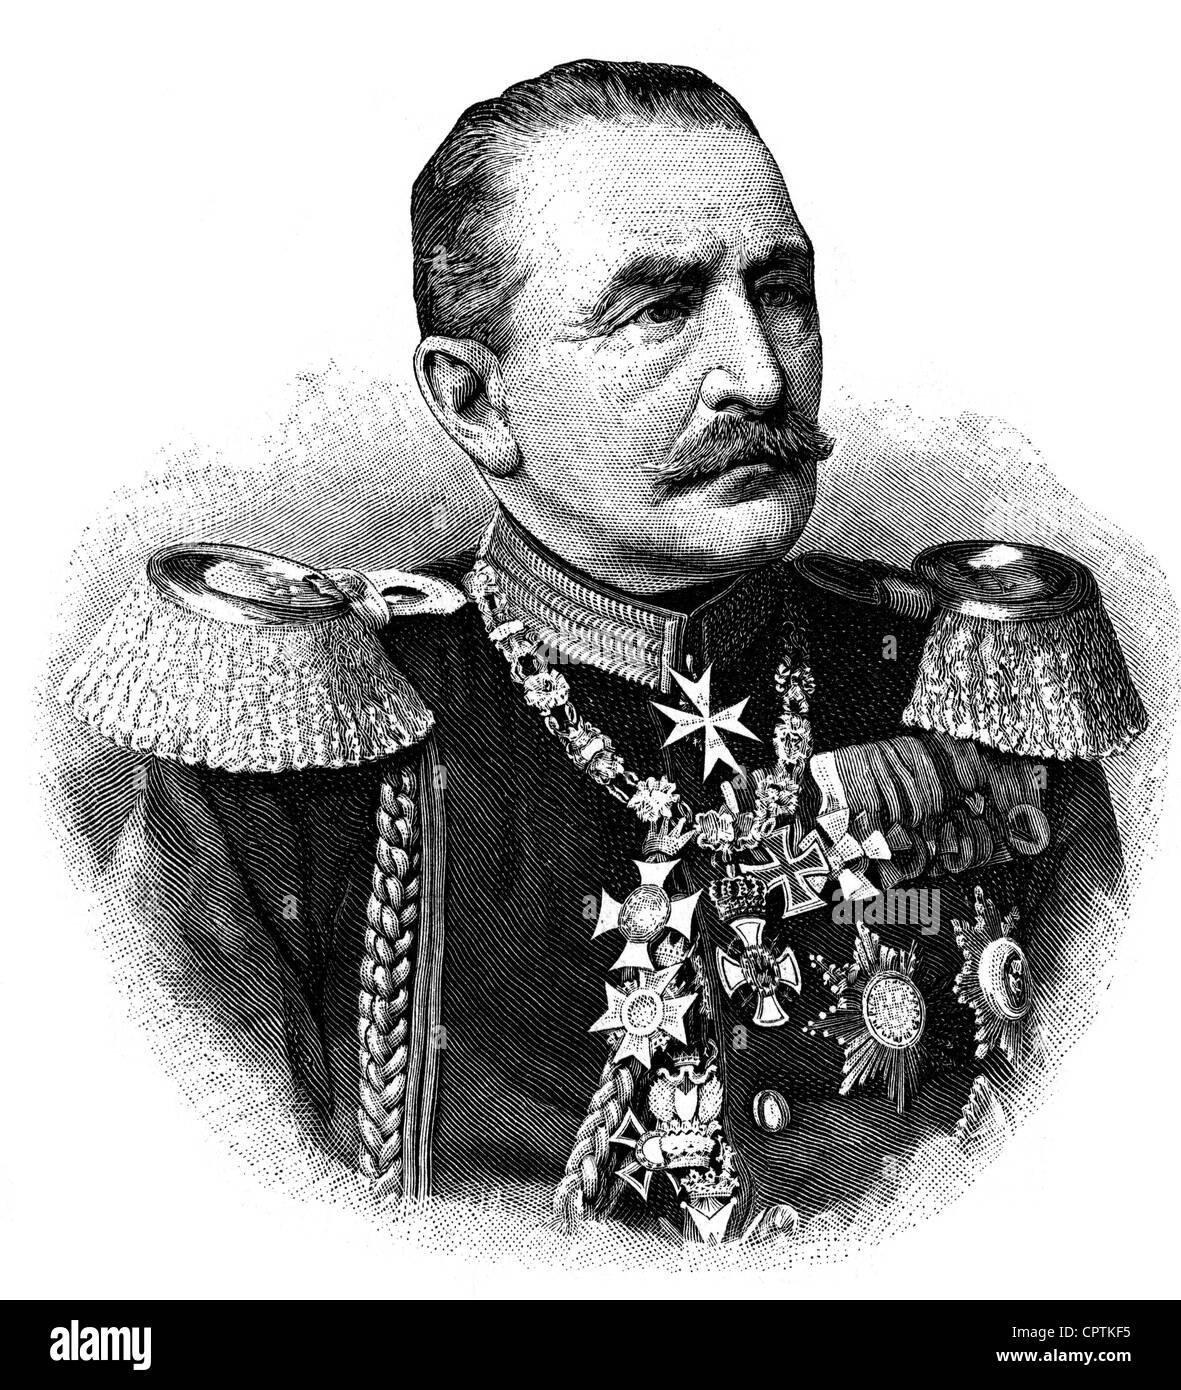 Obernitz, Hugh von, 16.4.1819 - 18.9.1901, German general of the infantry (Grand duchy of Baden), portrait, wood - Stock Image